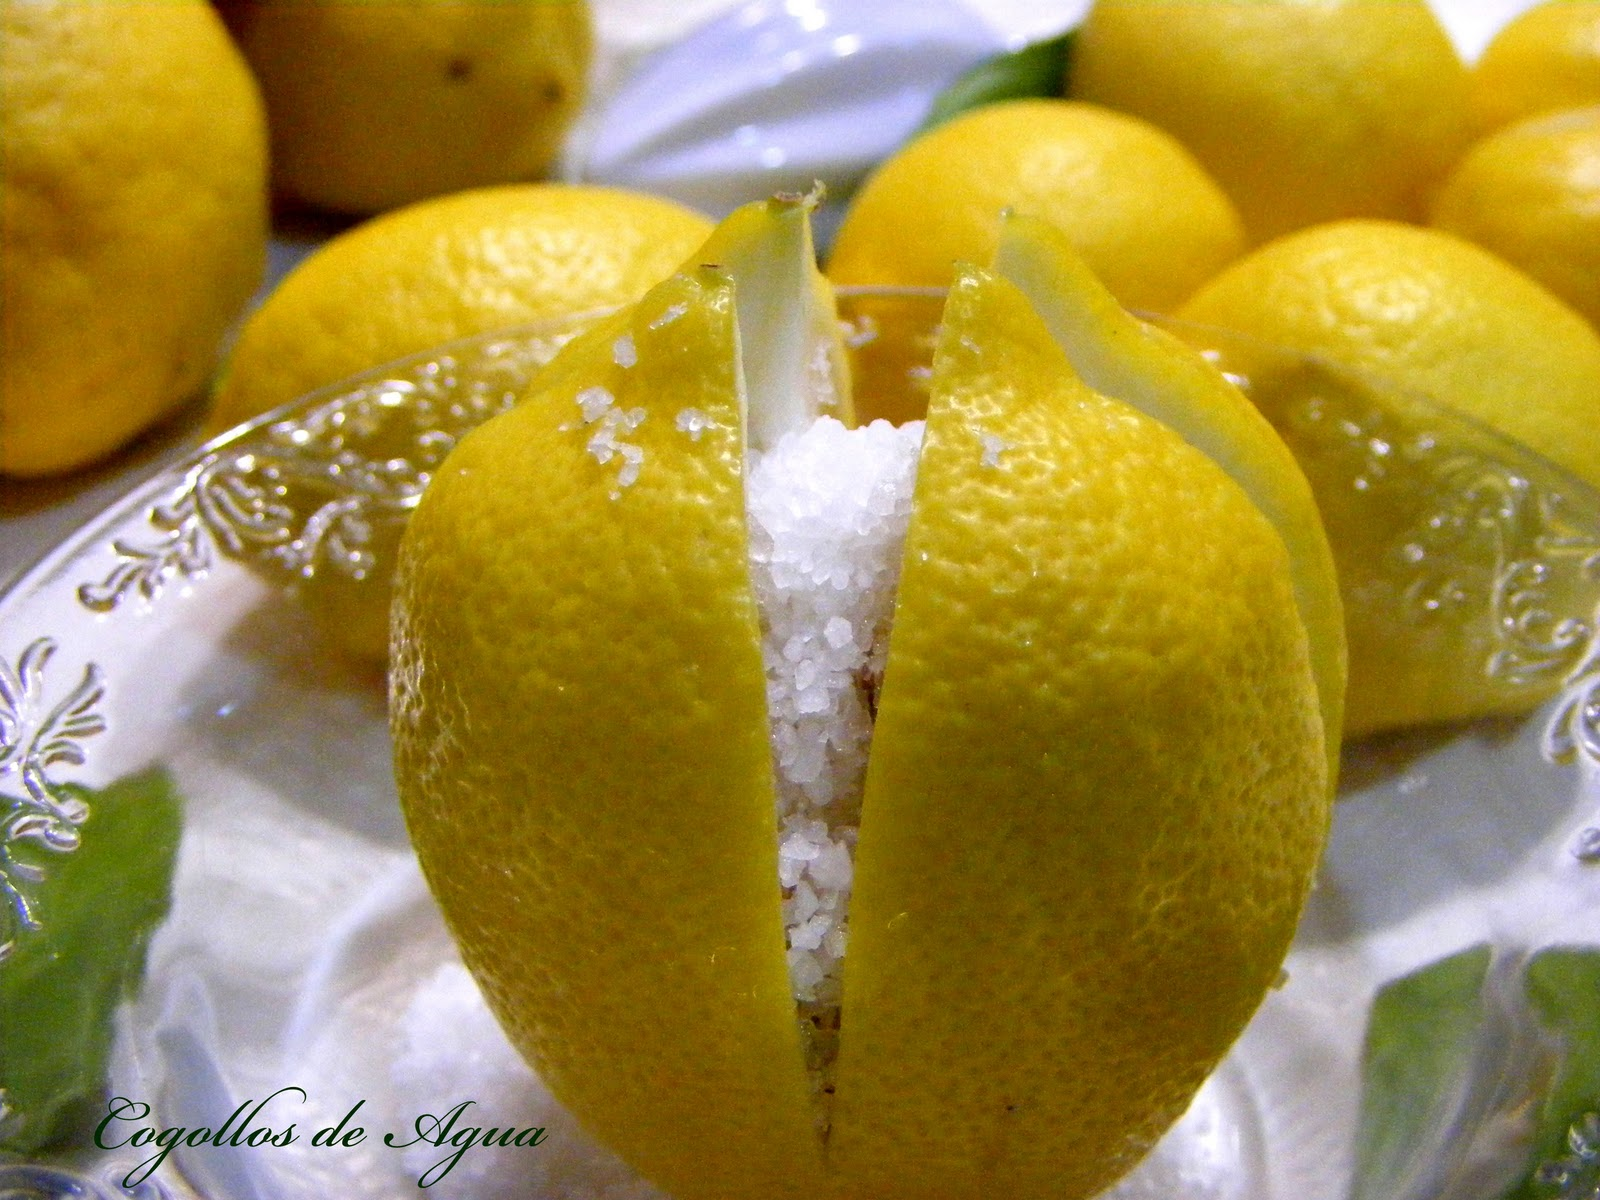 Ngeles amor elimina energias negativas con limones - Limpiar casa malas energias ...